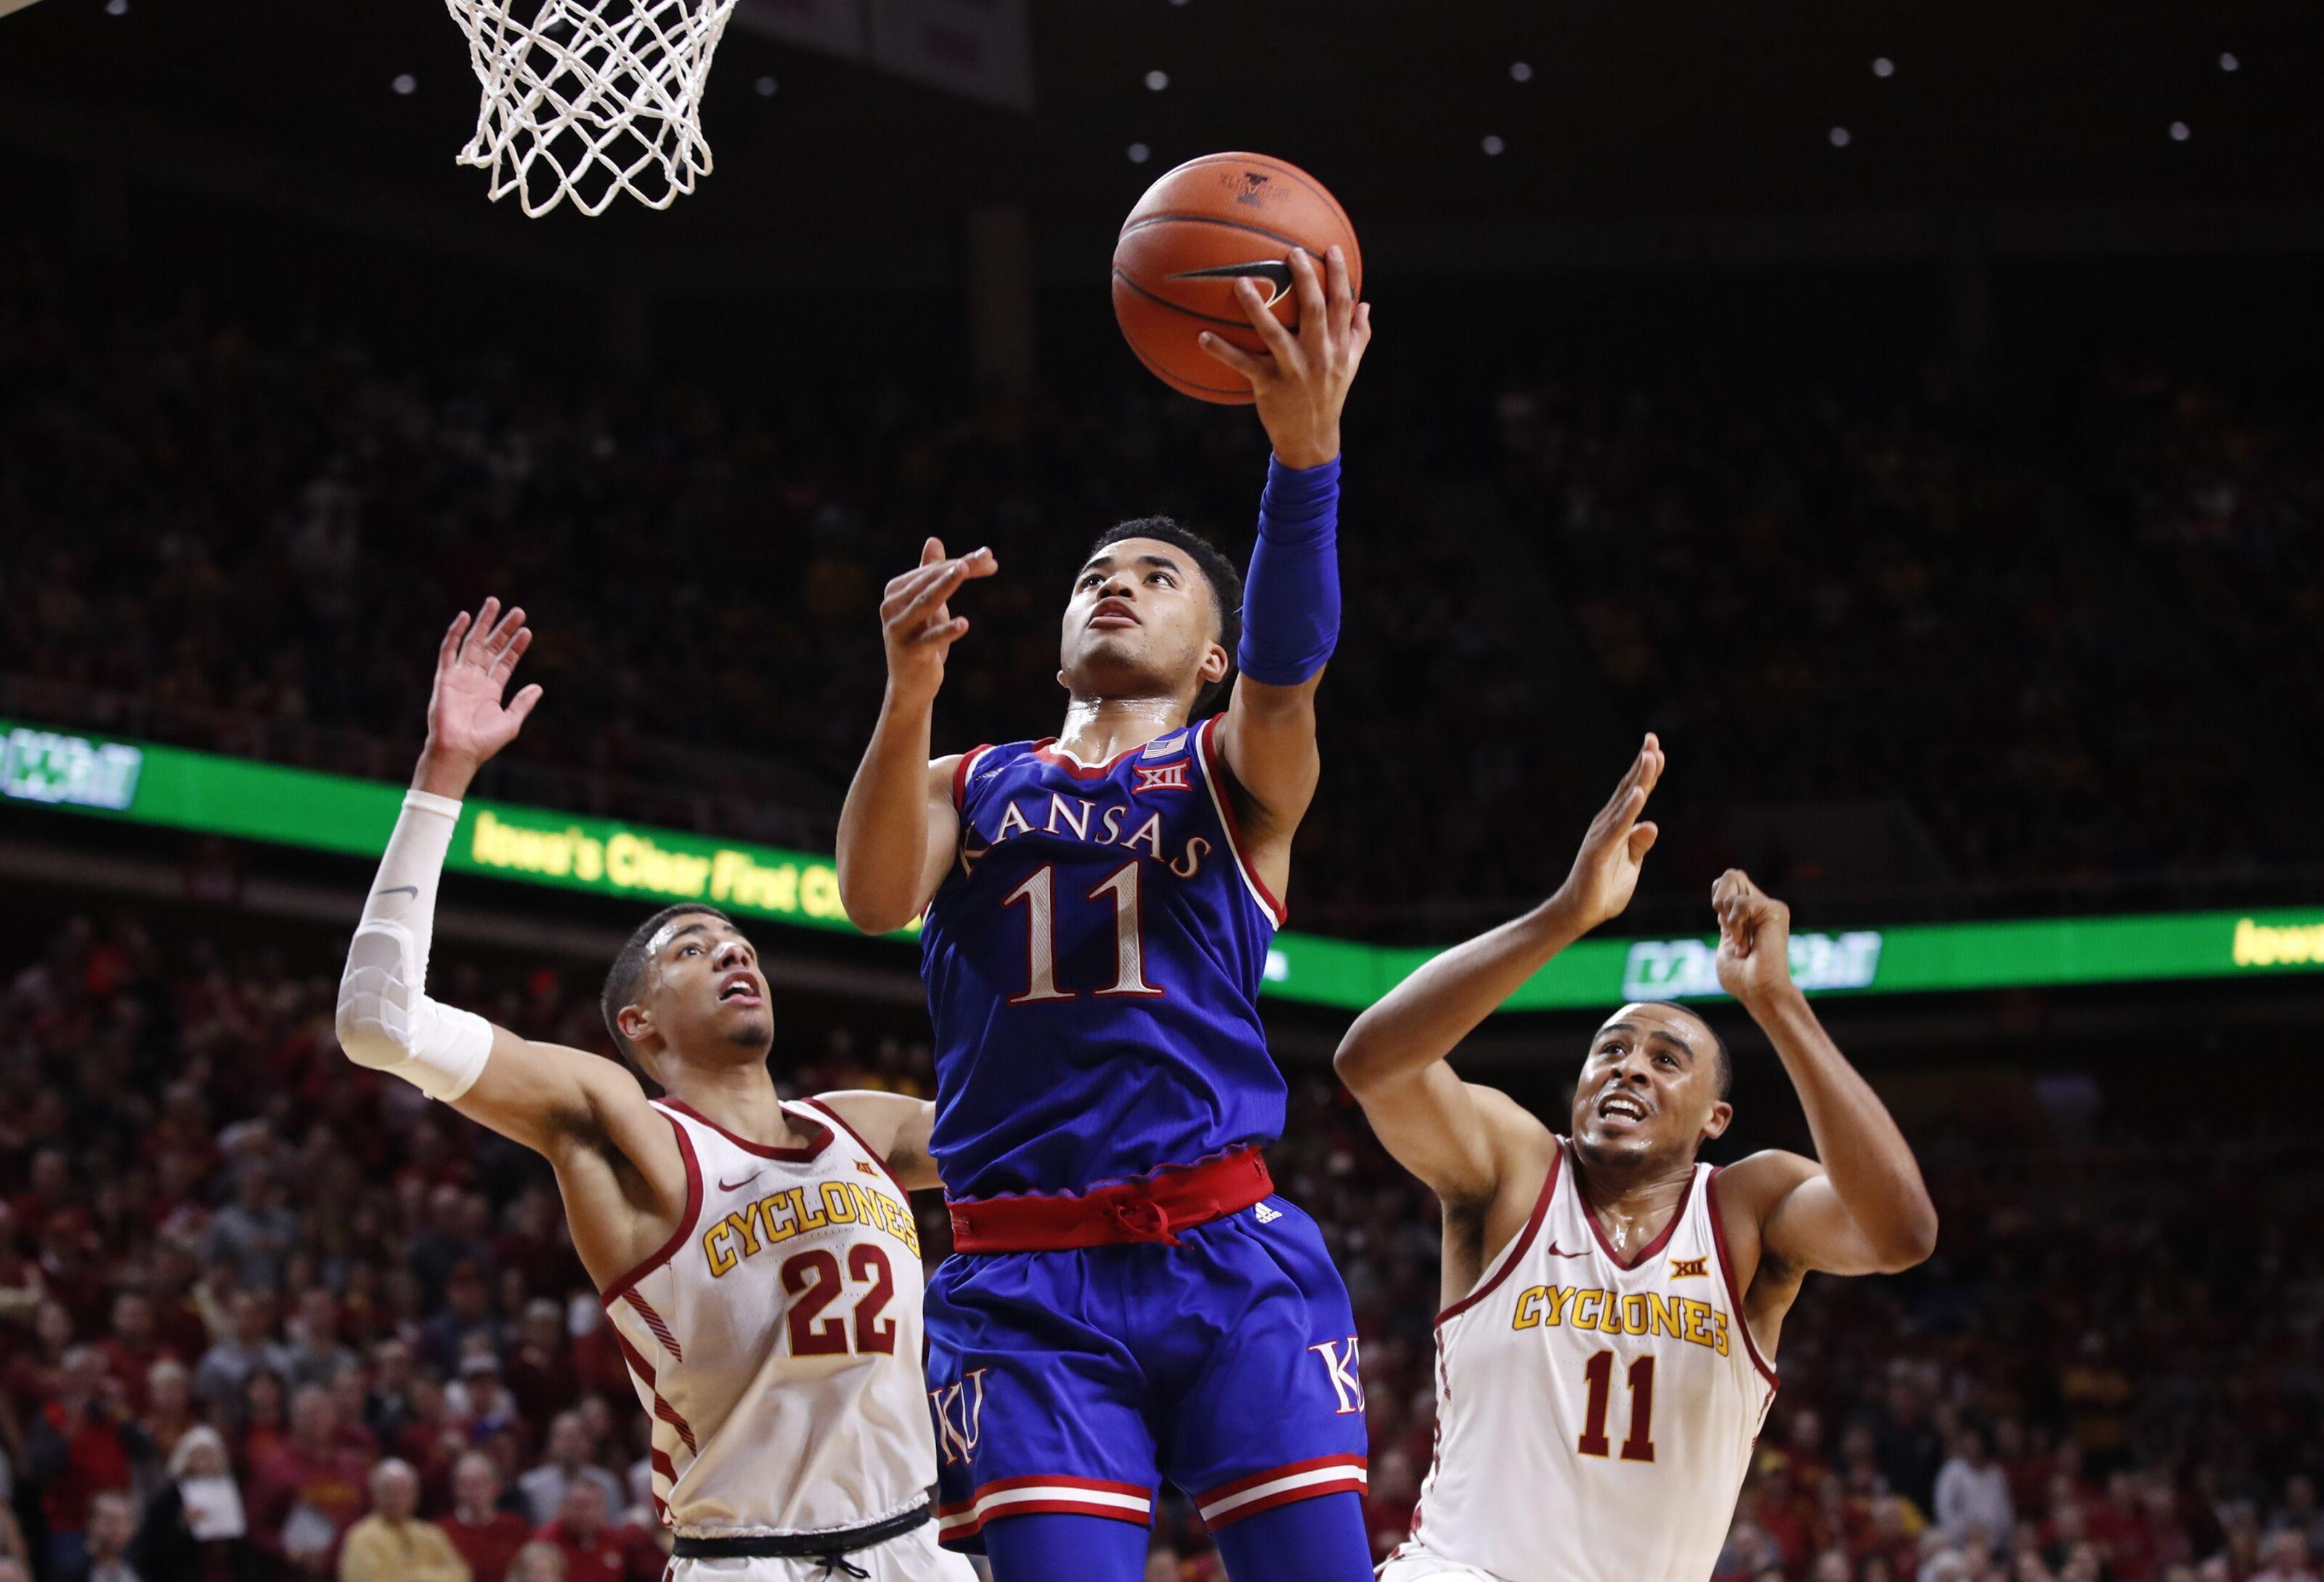 Kansas Basketball: The most intriguing Big 12 matchups for the Jayhawks